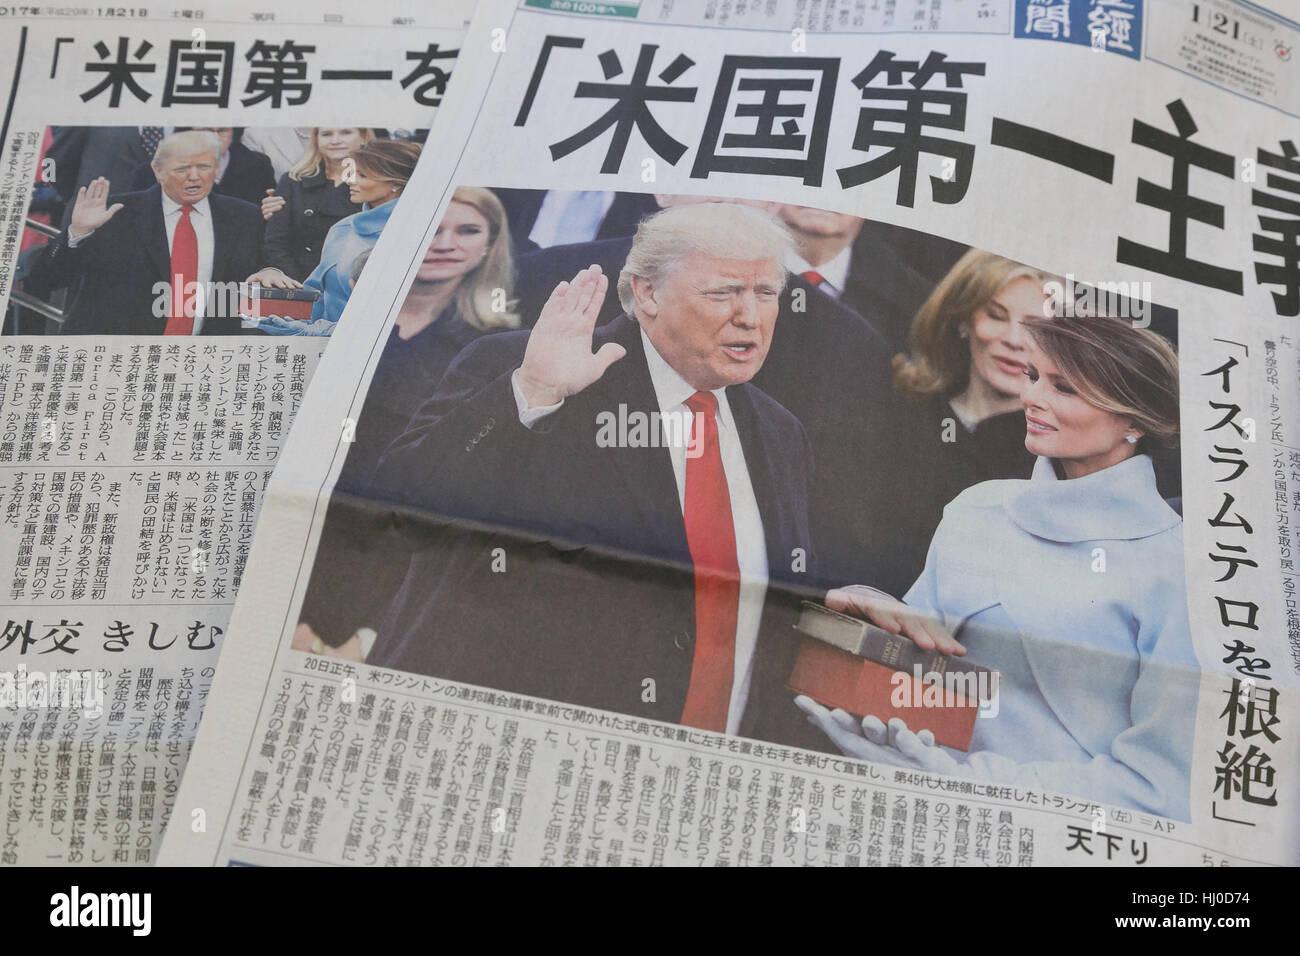 Tokio, Japan. 21. Januar 2017. Japanische Zeitungen feature-News auf Donald Trump Amtseinführung als 45. Präsident Stockbild